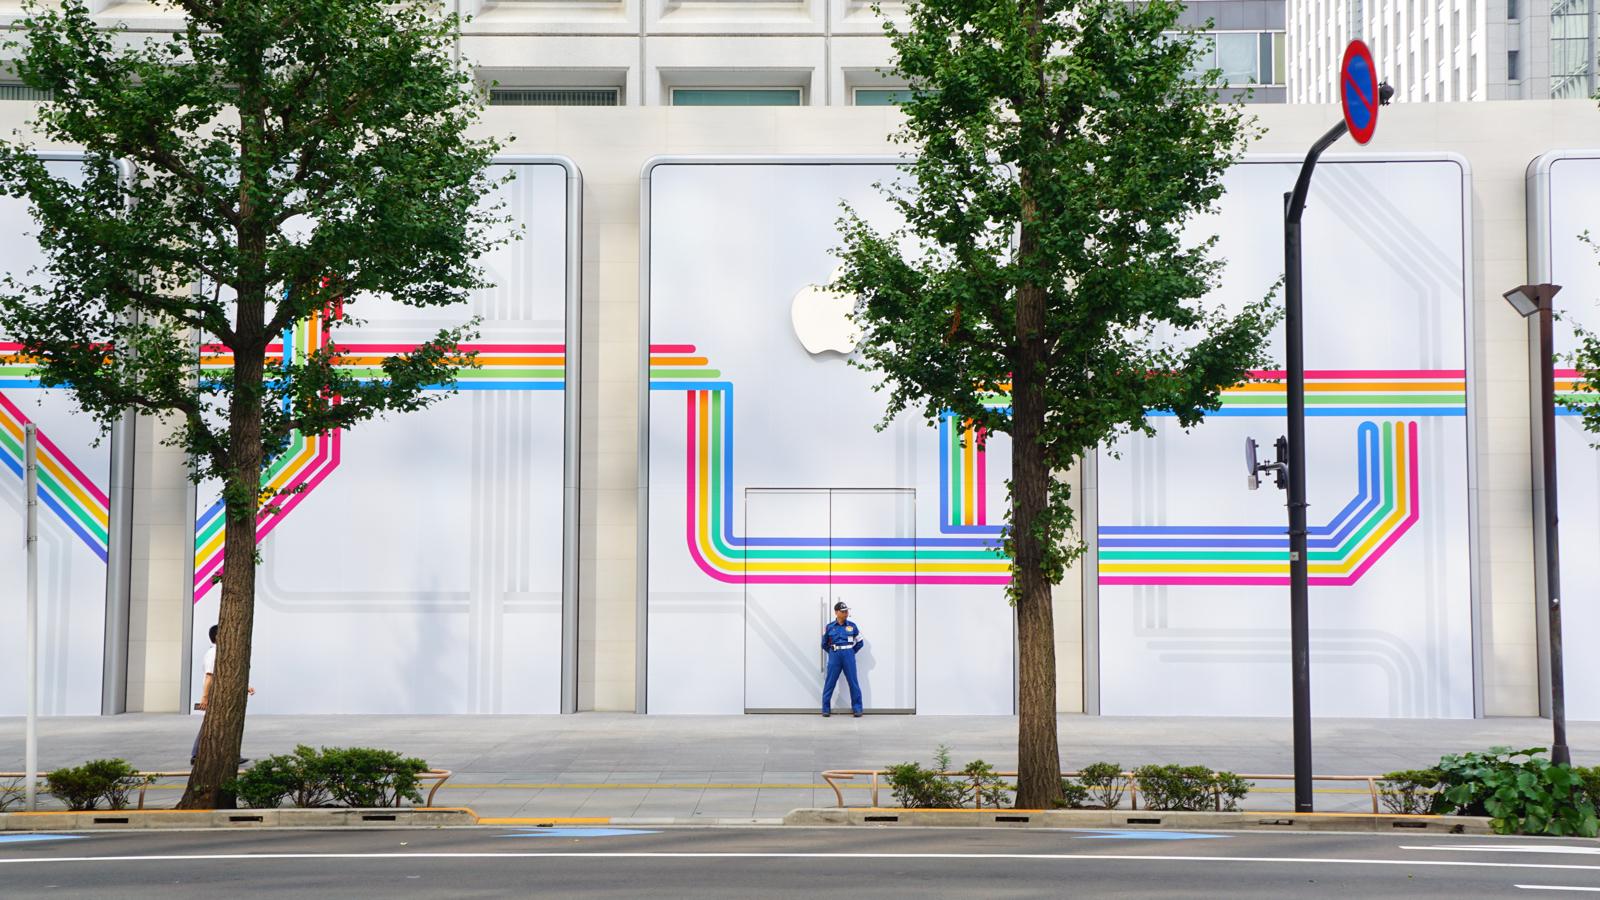 Apple丸の内、年内オープンが確定的に。都内5店舗目のApple Store